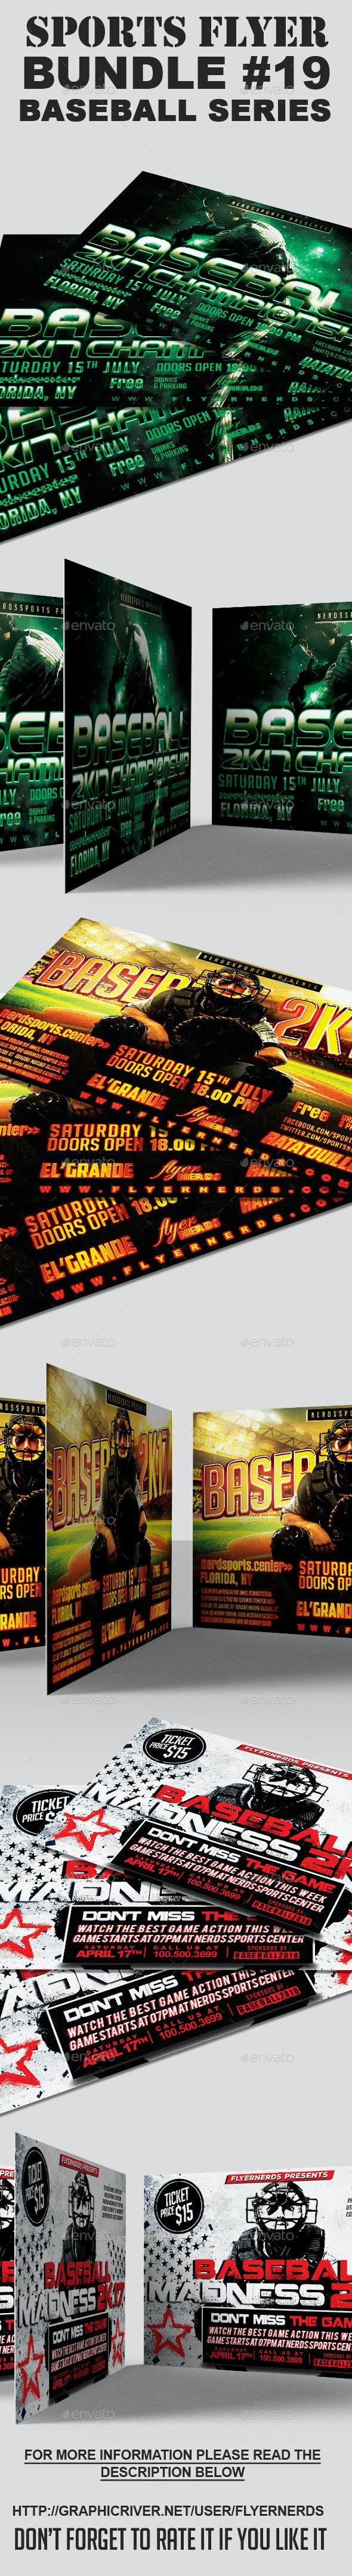 Sports Flyer Bundle 19 Baseball Series - Sports Events